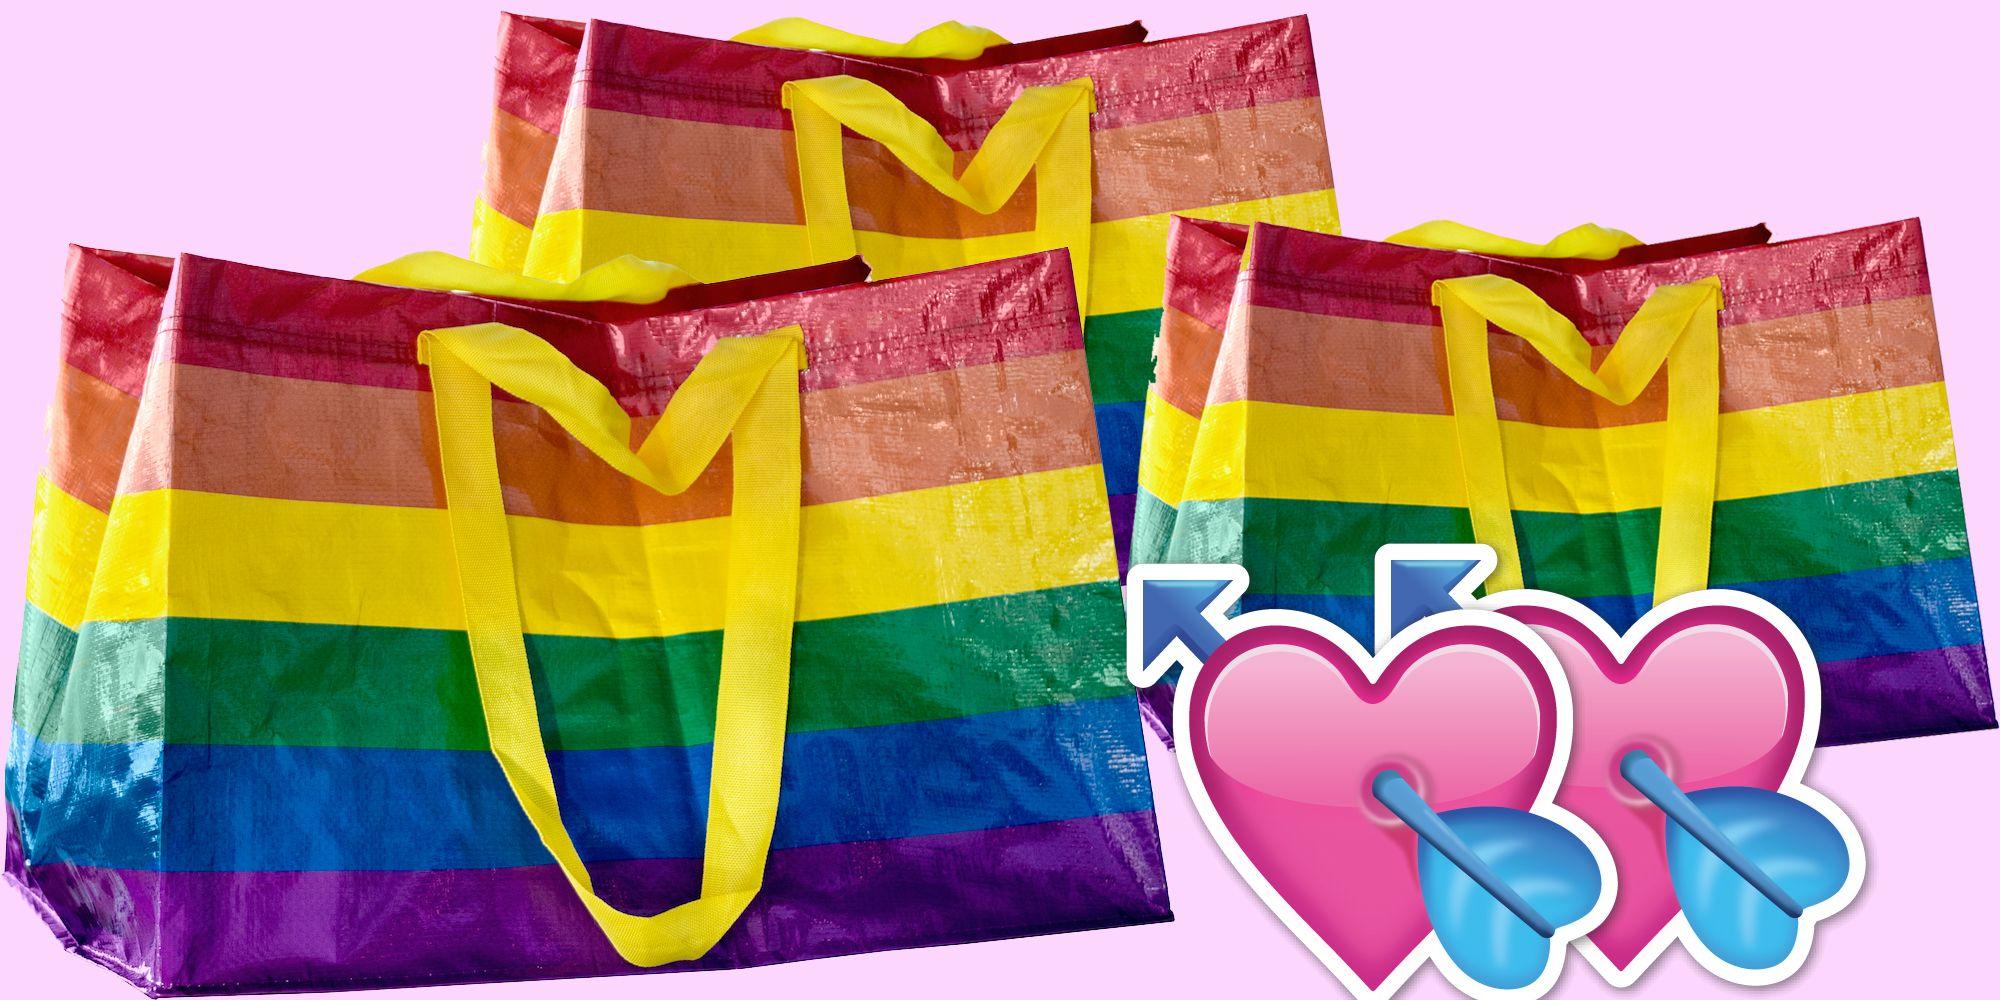 Contro Arcobaleno L'omofobia Borsa Ikea La vw0mn8N